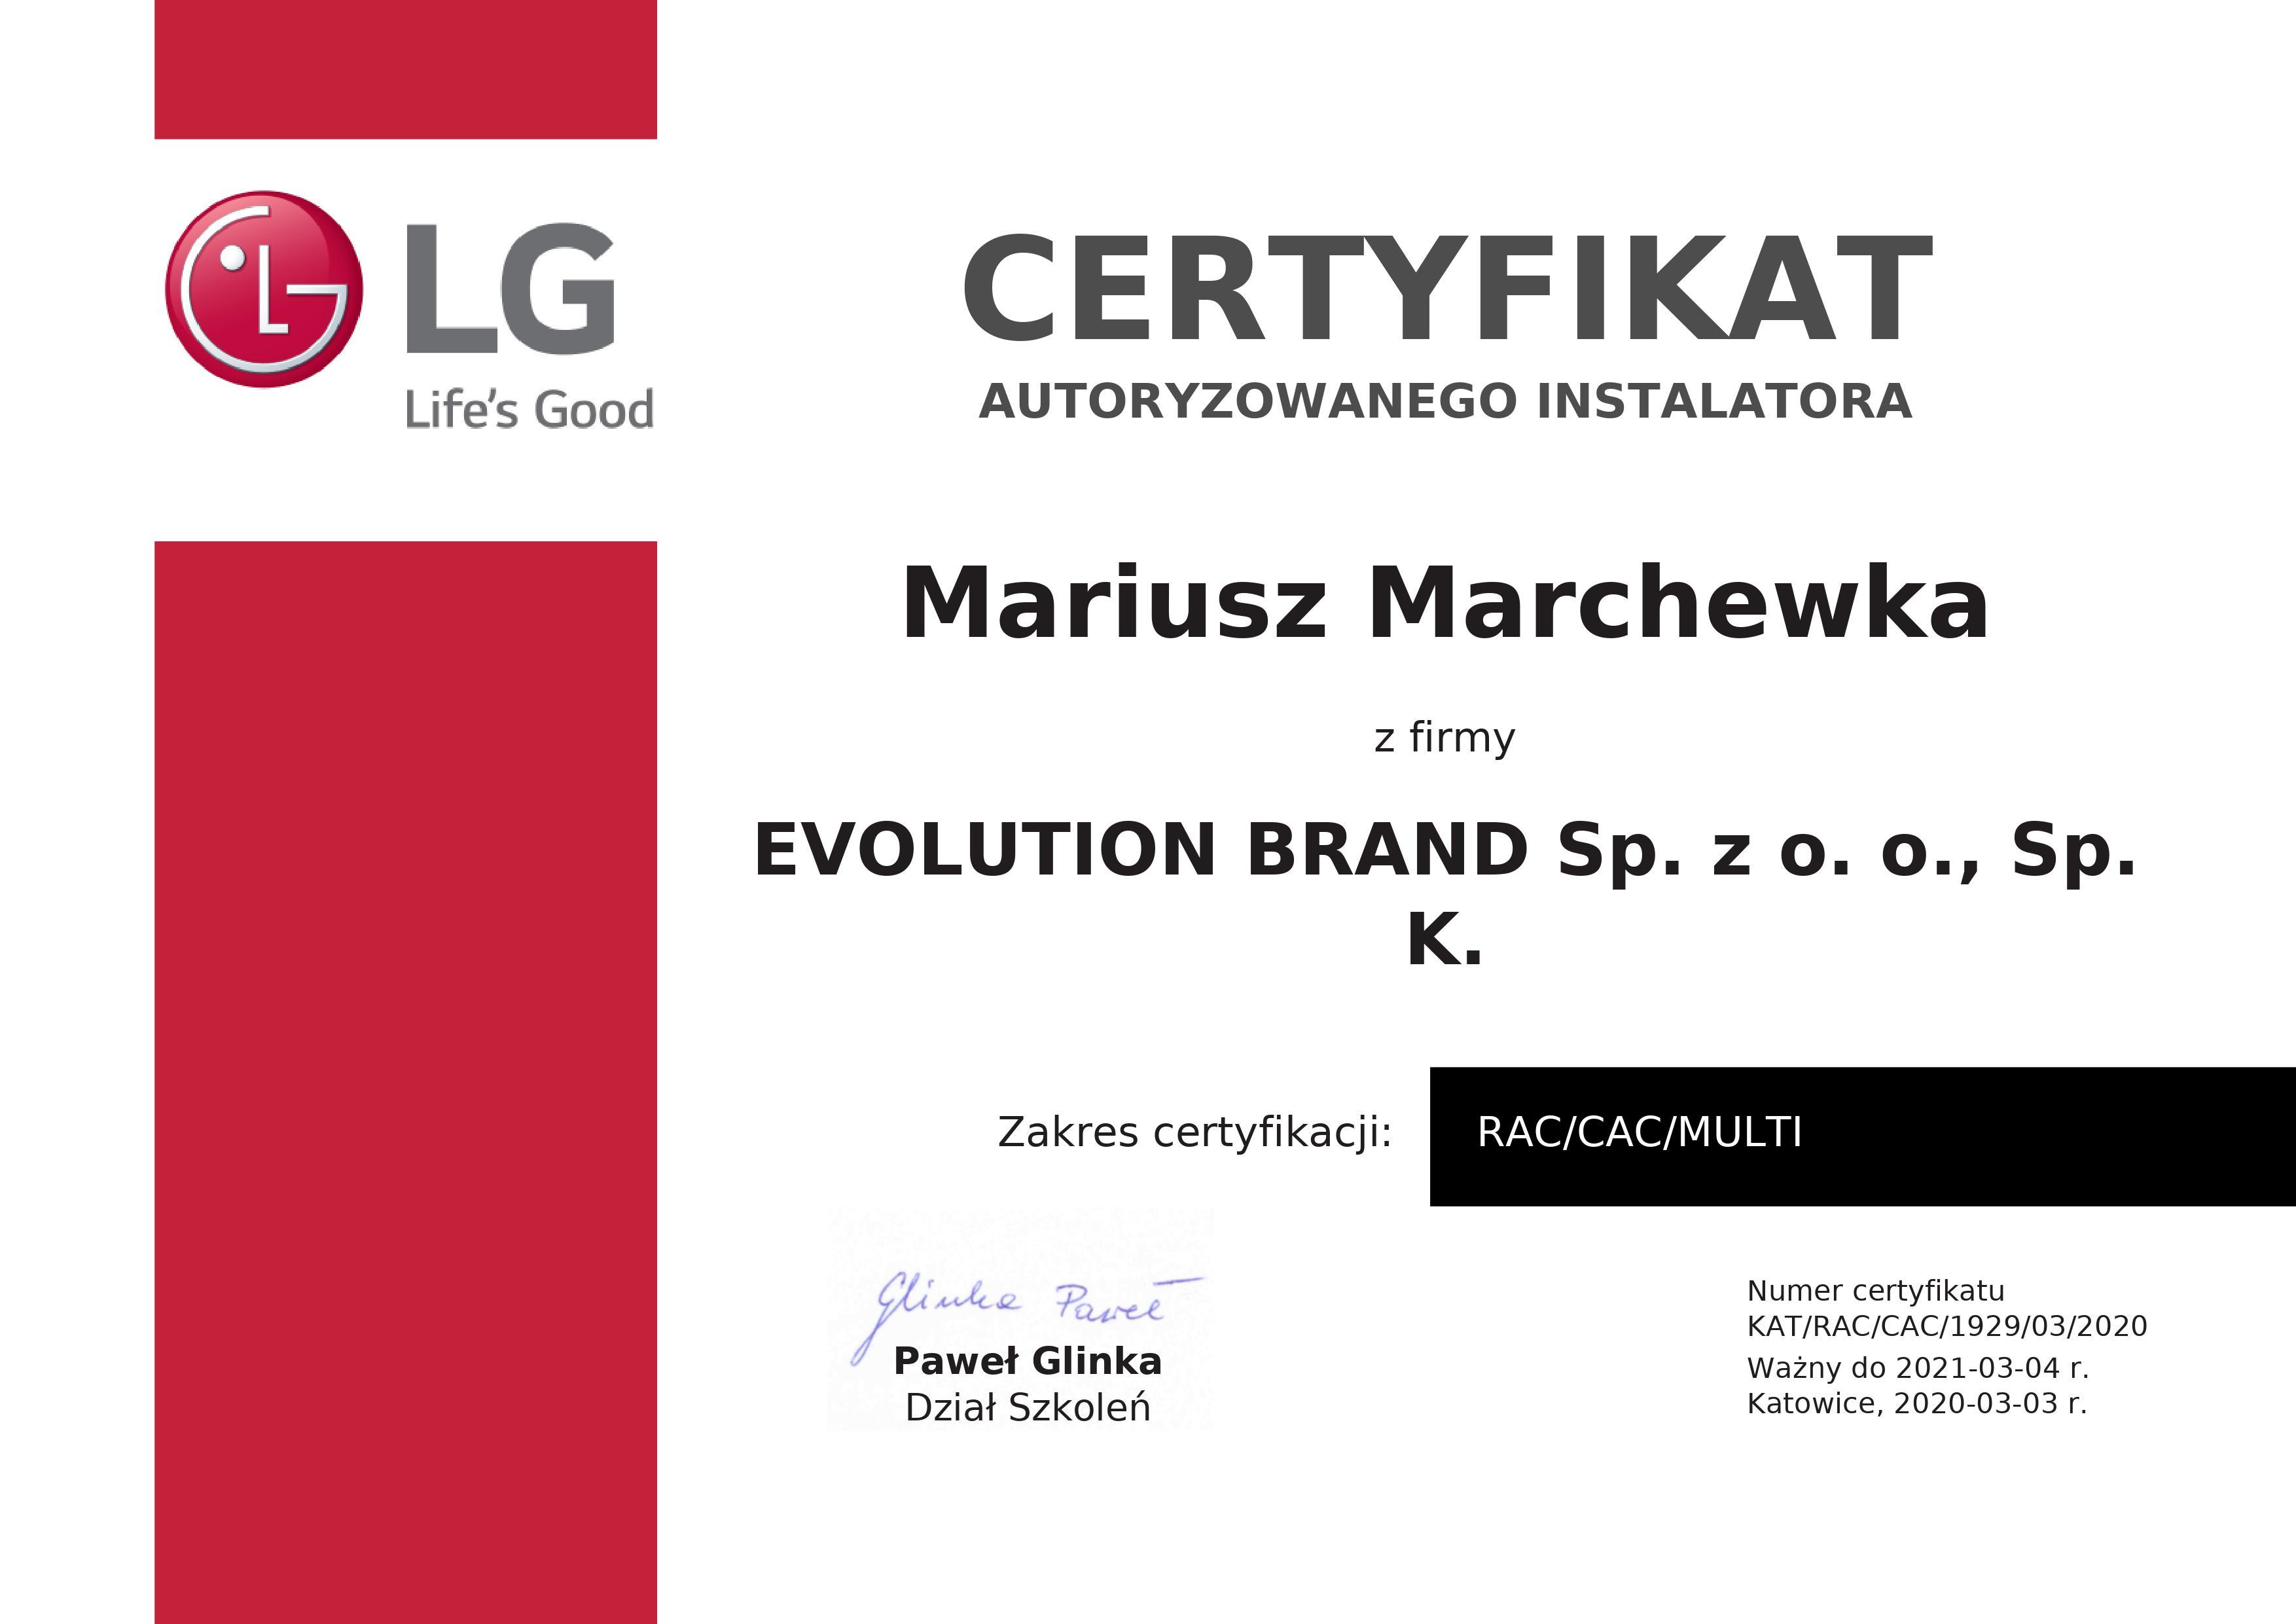 Cetryfikat LG Evolution Brand